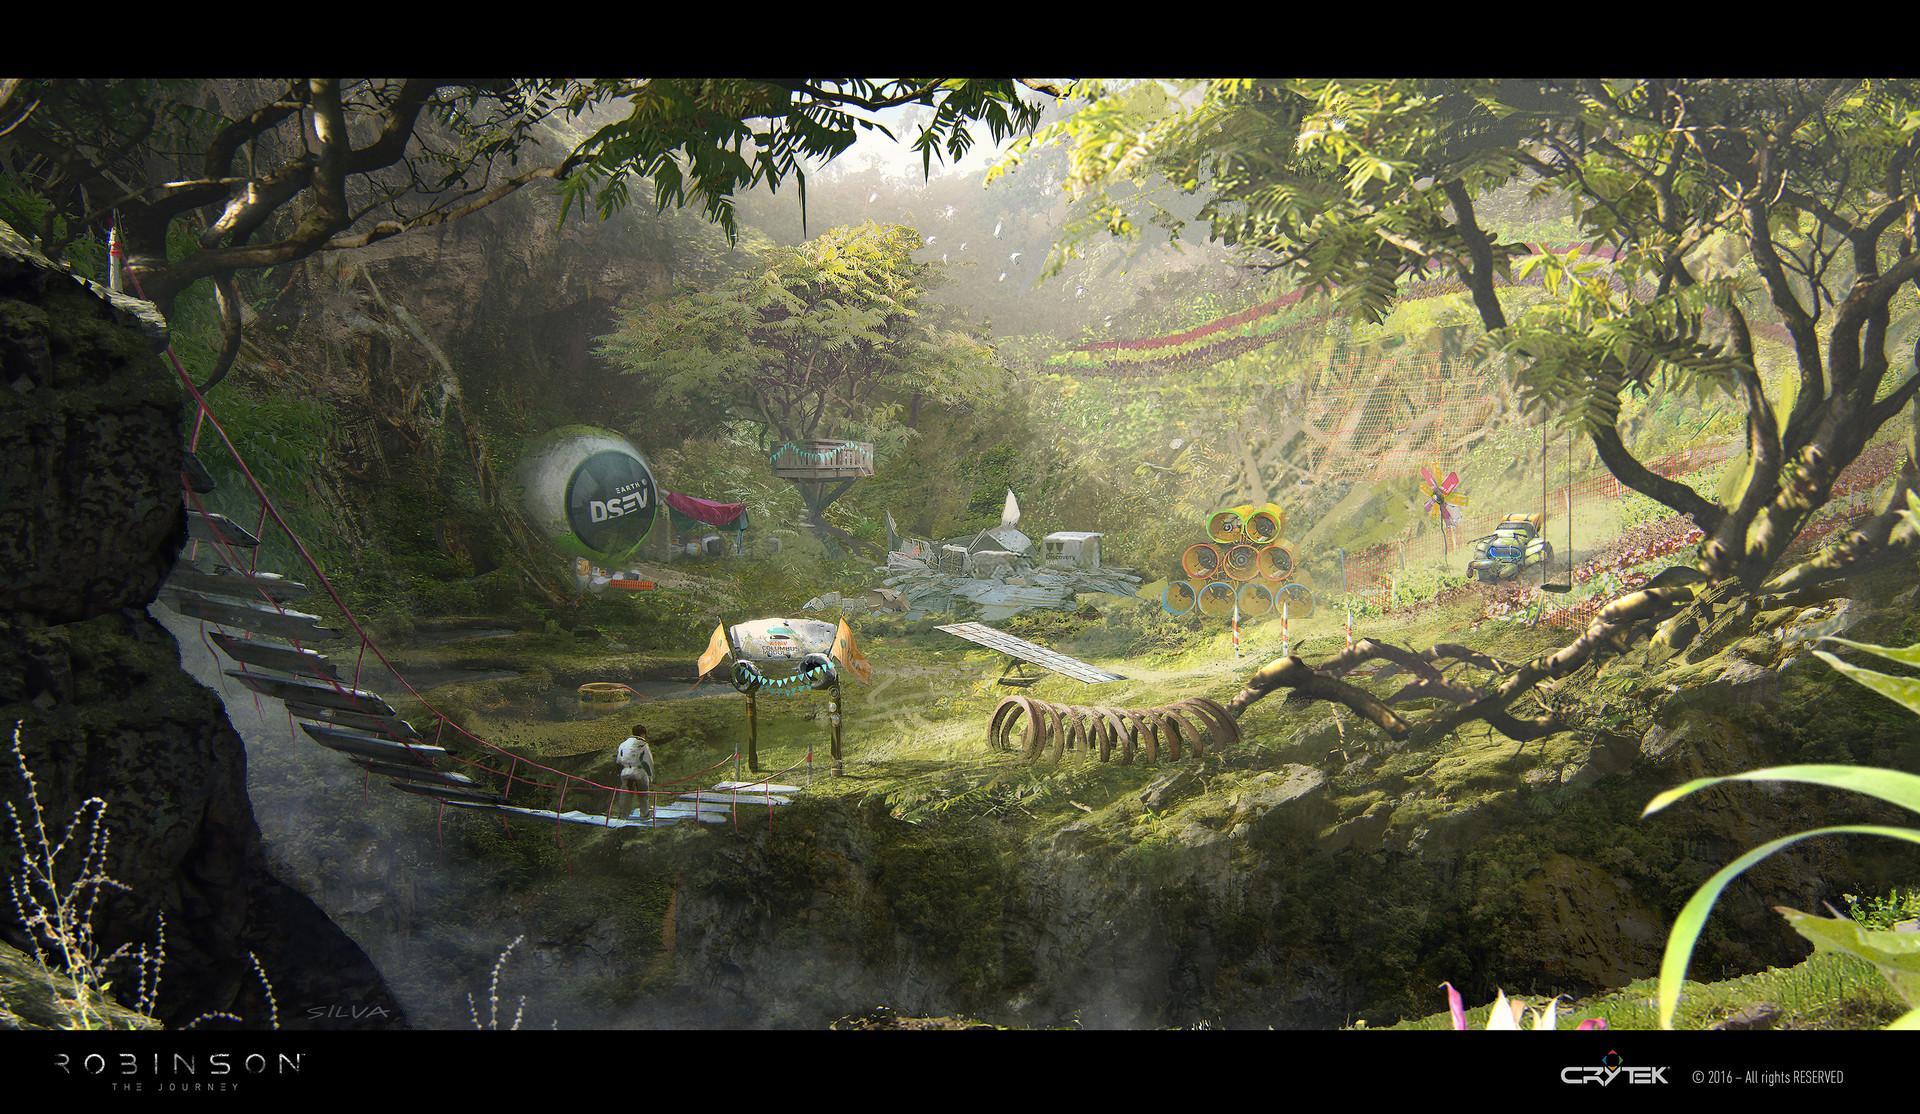 joao silva robinson the journey front view pod area concept